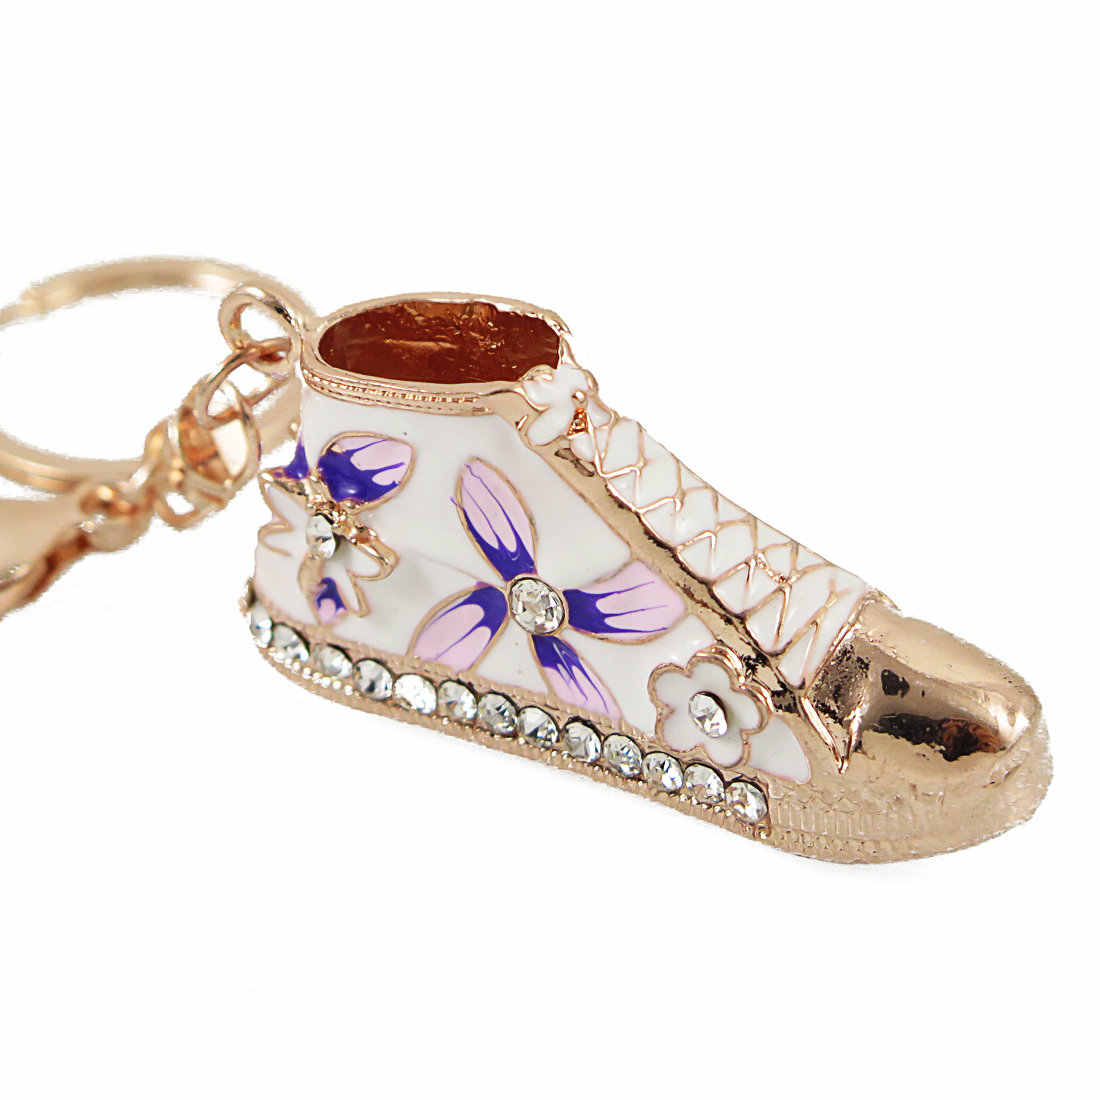 4fd183ea3f25 ... 2018 Hot Sale High Quality Crystal Shoe Keyring Keychain Rhinestone  Purse Charm Pendant Bag NMD Key